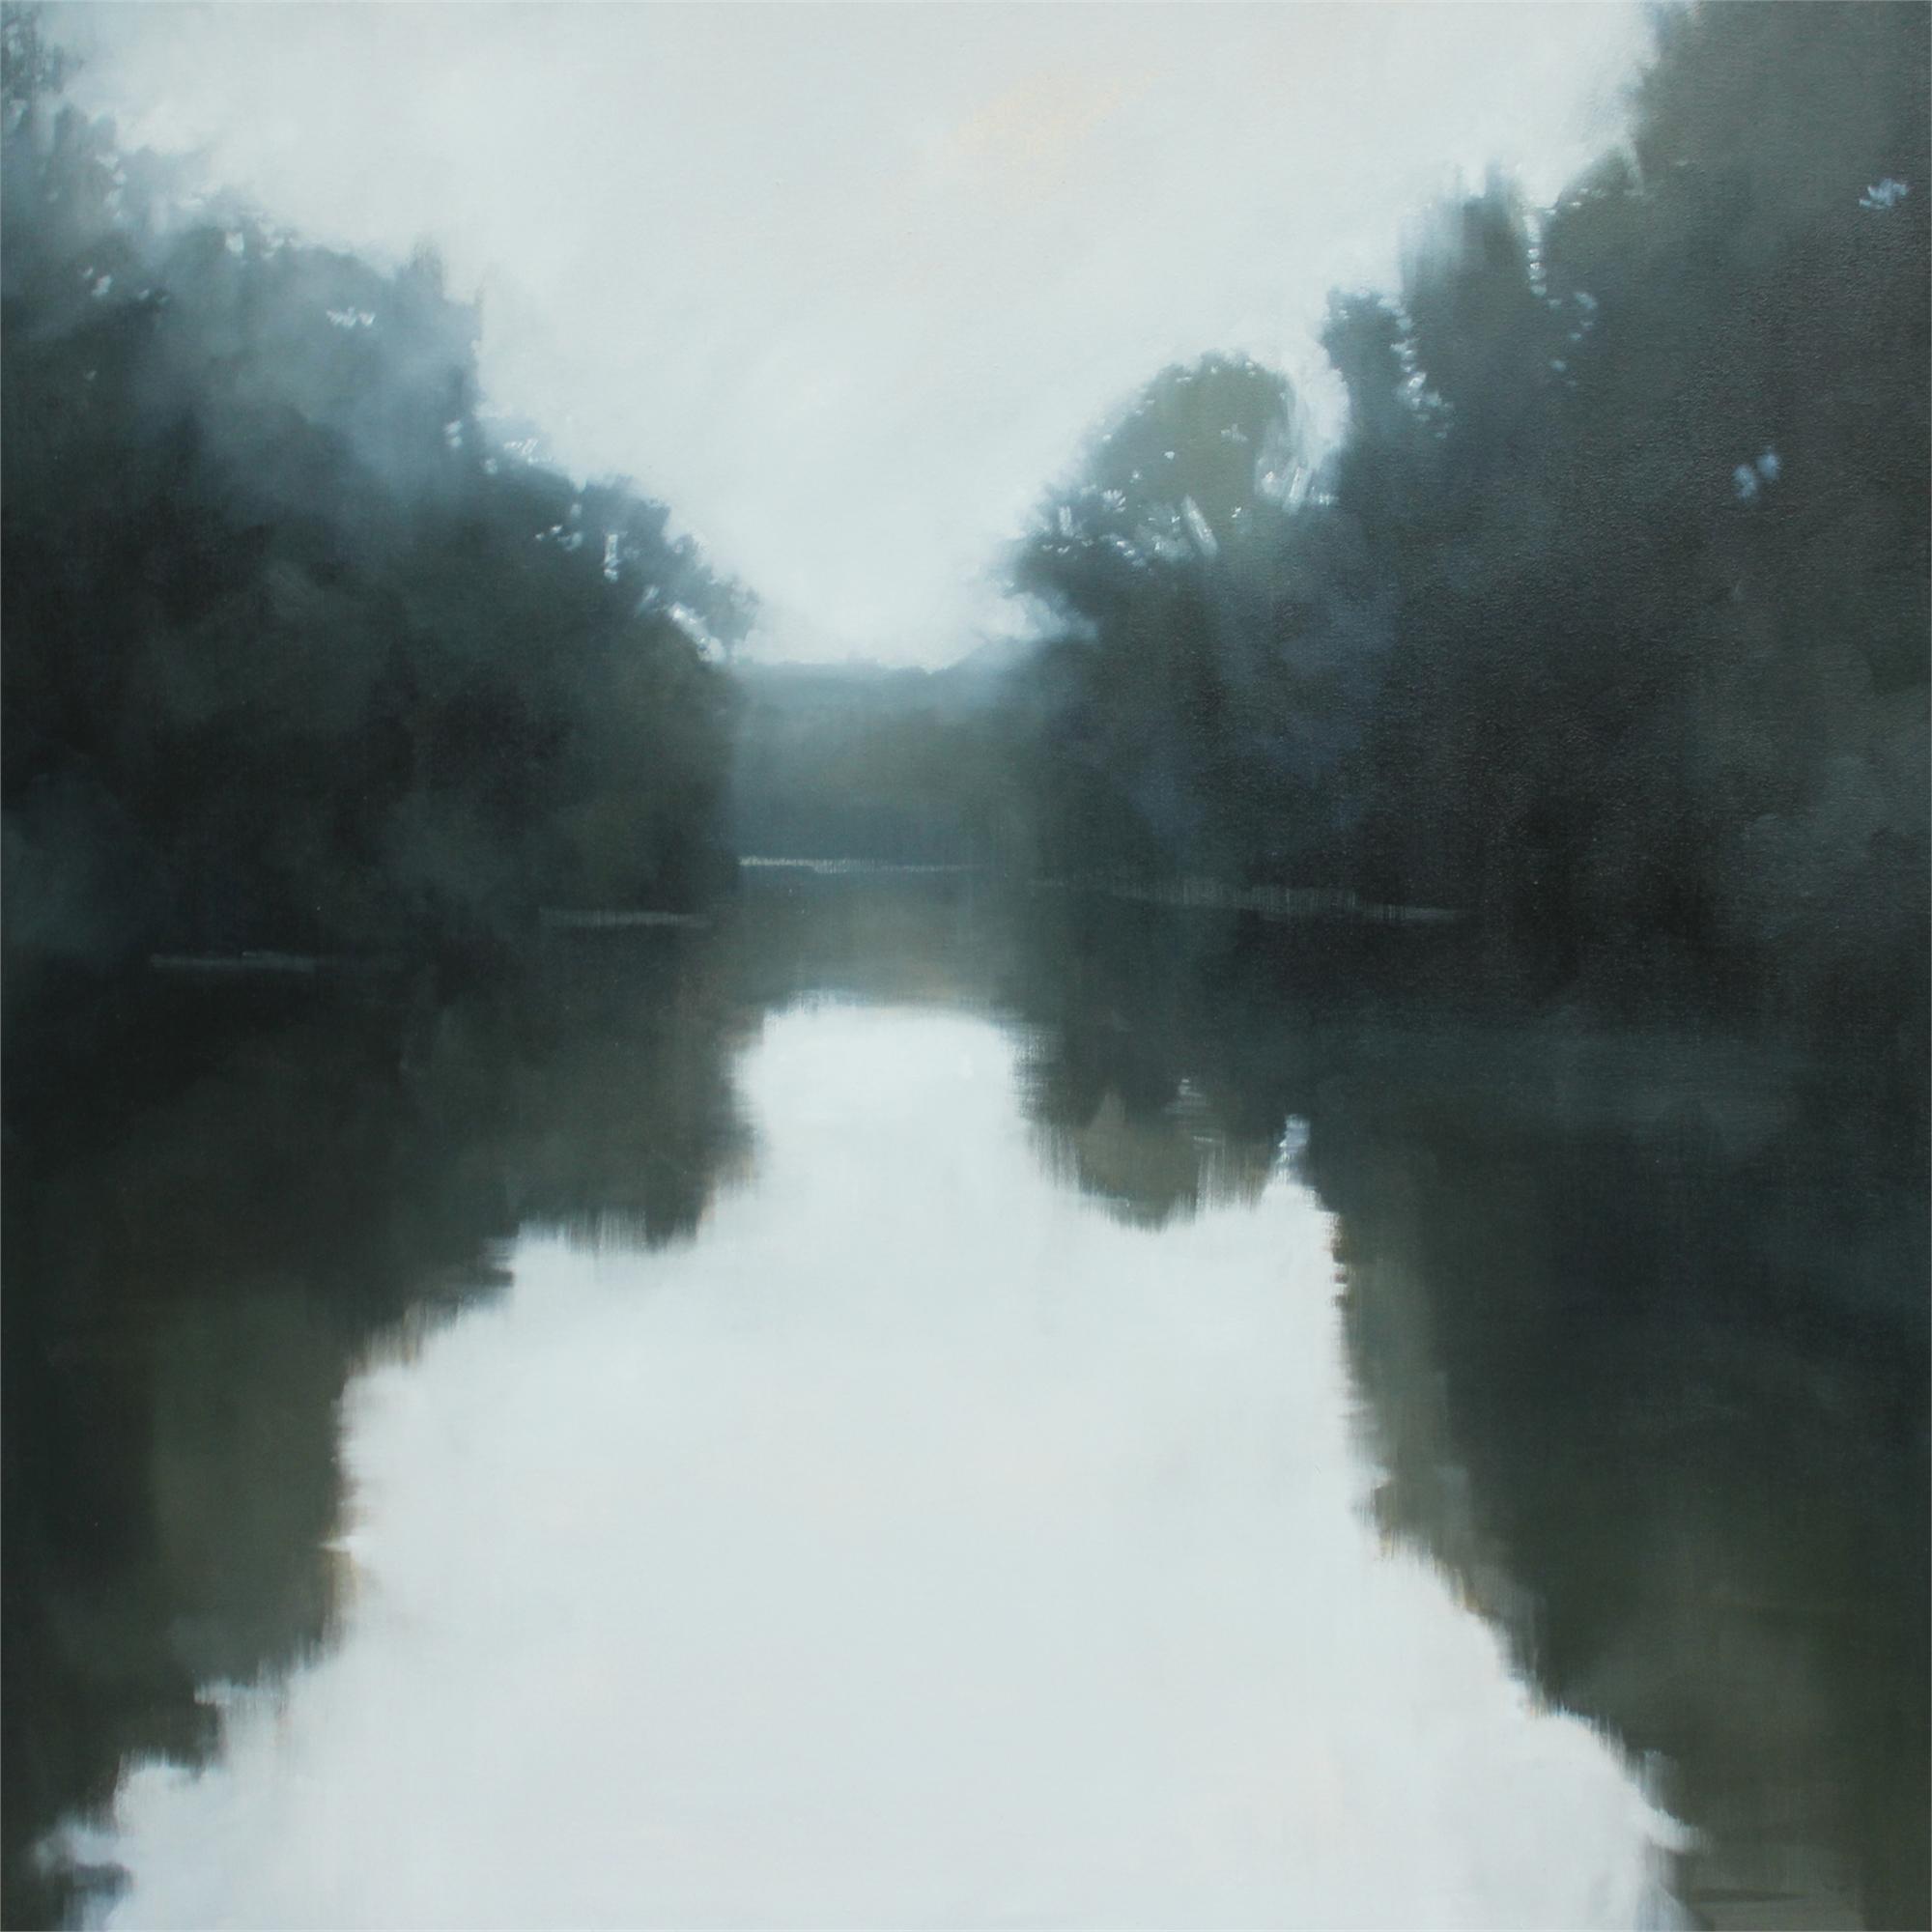 Shadow Passage by Megan Lightell